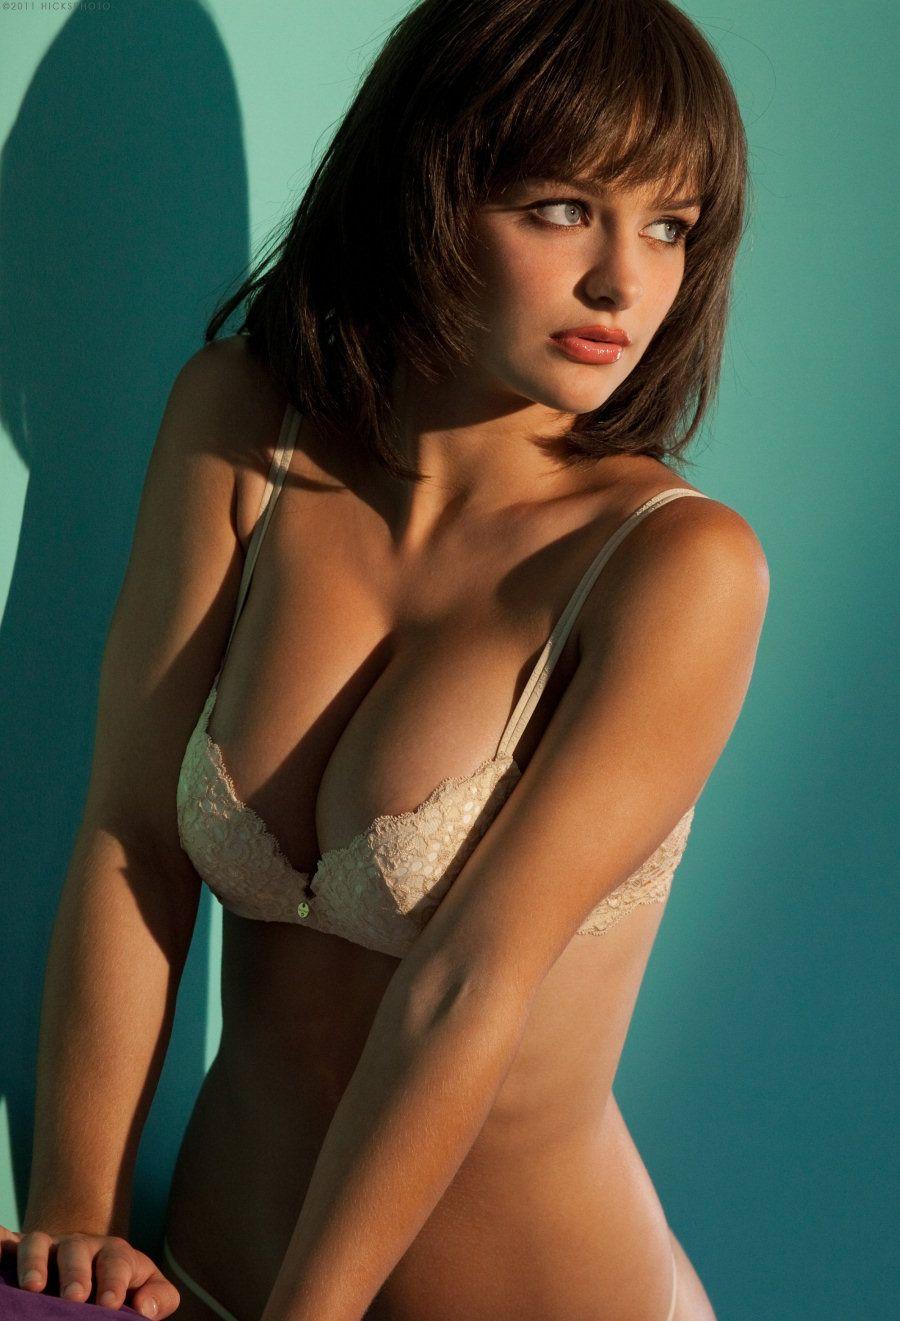 Lena li nude